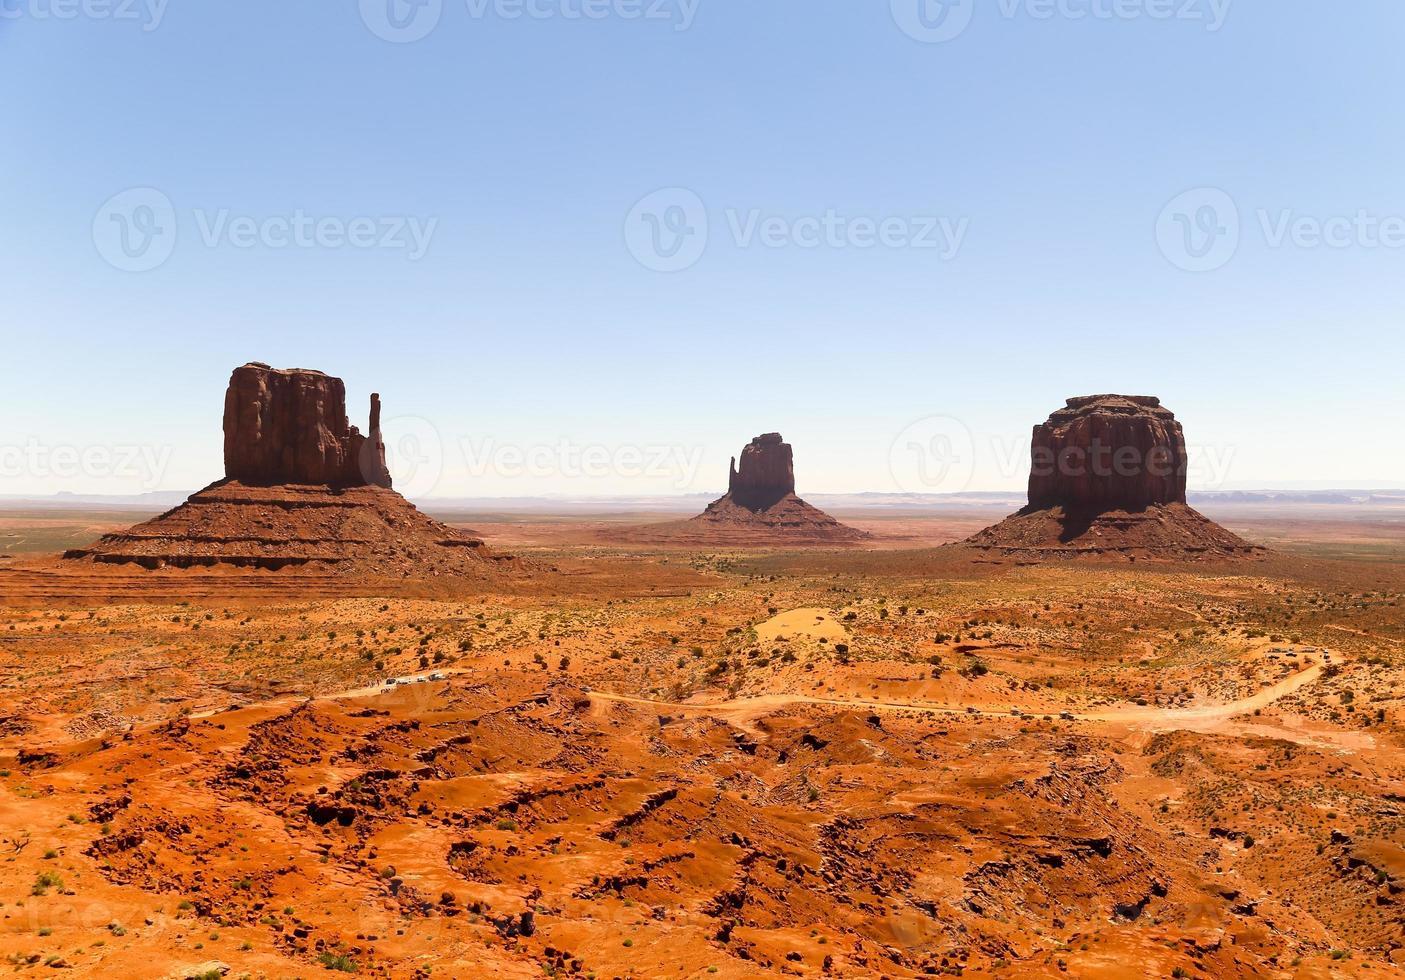 paisaje occidental foto